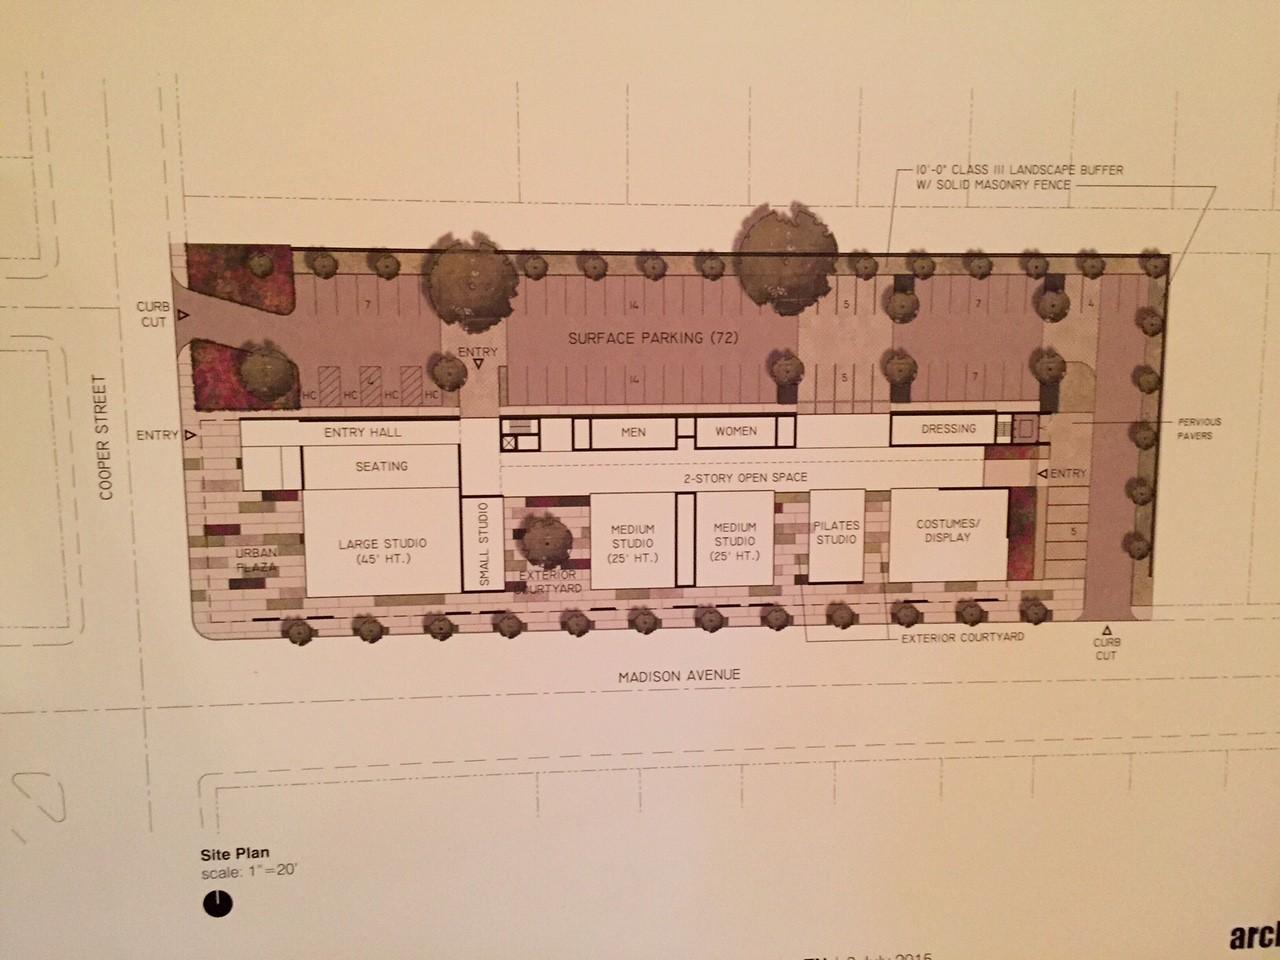 Ballet memphis overton square design plans revealed news for Memphis plan